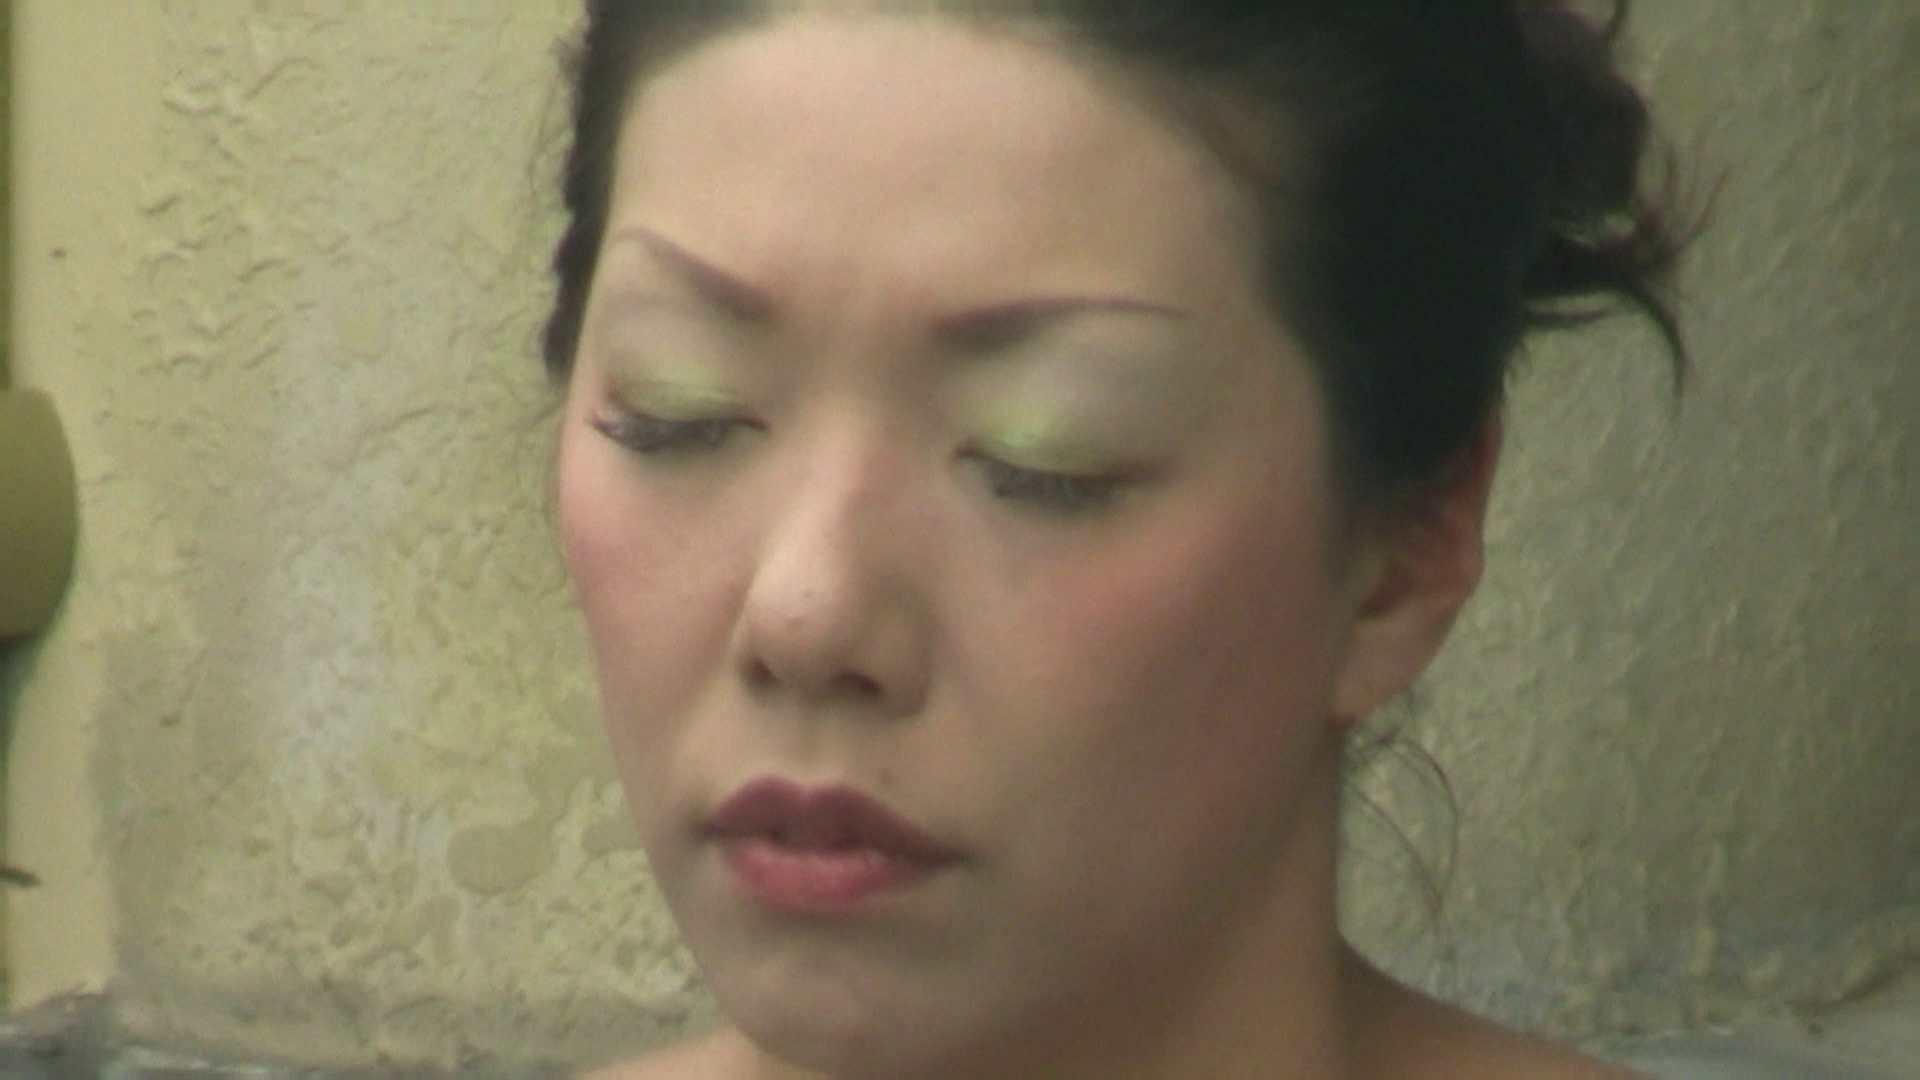 高画質露天女風呂観察 vol.036 OLセックス | 乙女  96画像 85